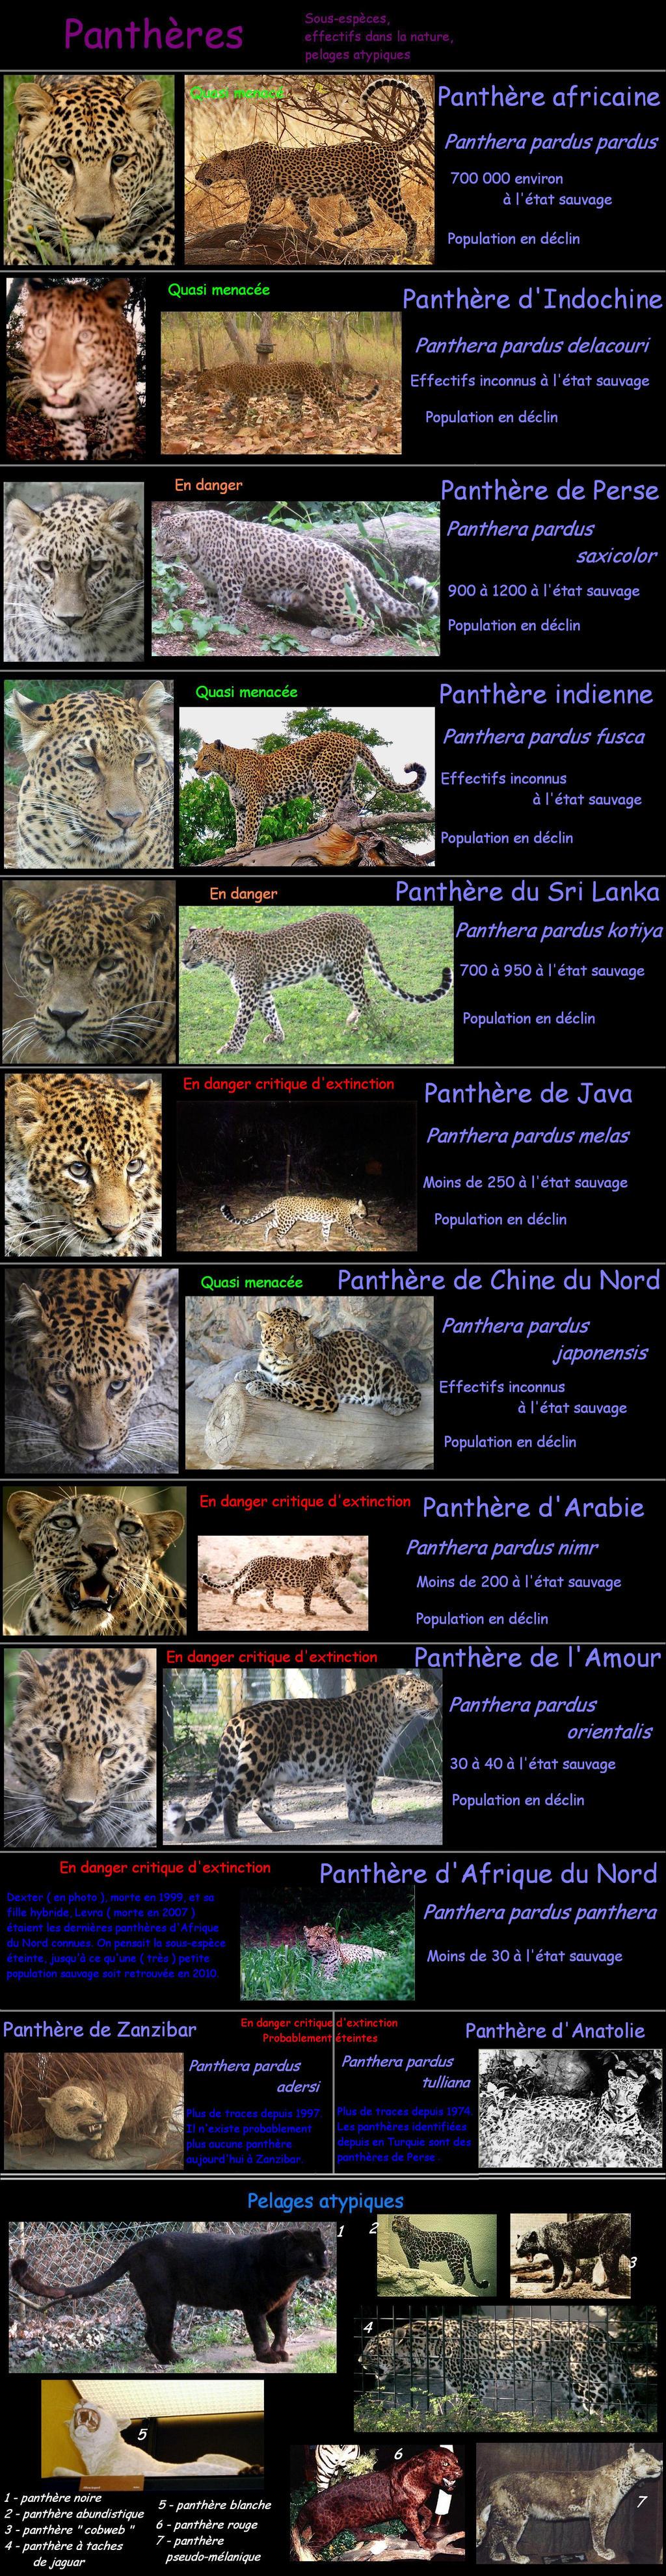 PANTHERE OU LEOPARD - Panthera pardus - Page 2 Leopard___subspecies__colors_by_lena_panthera-d3jqv6i